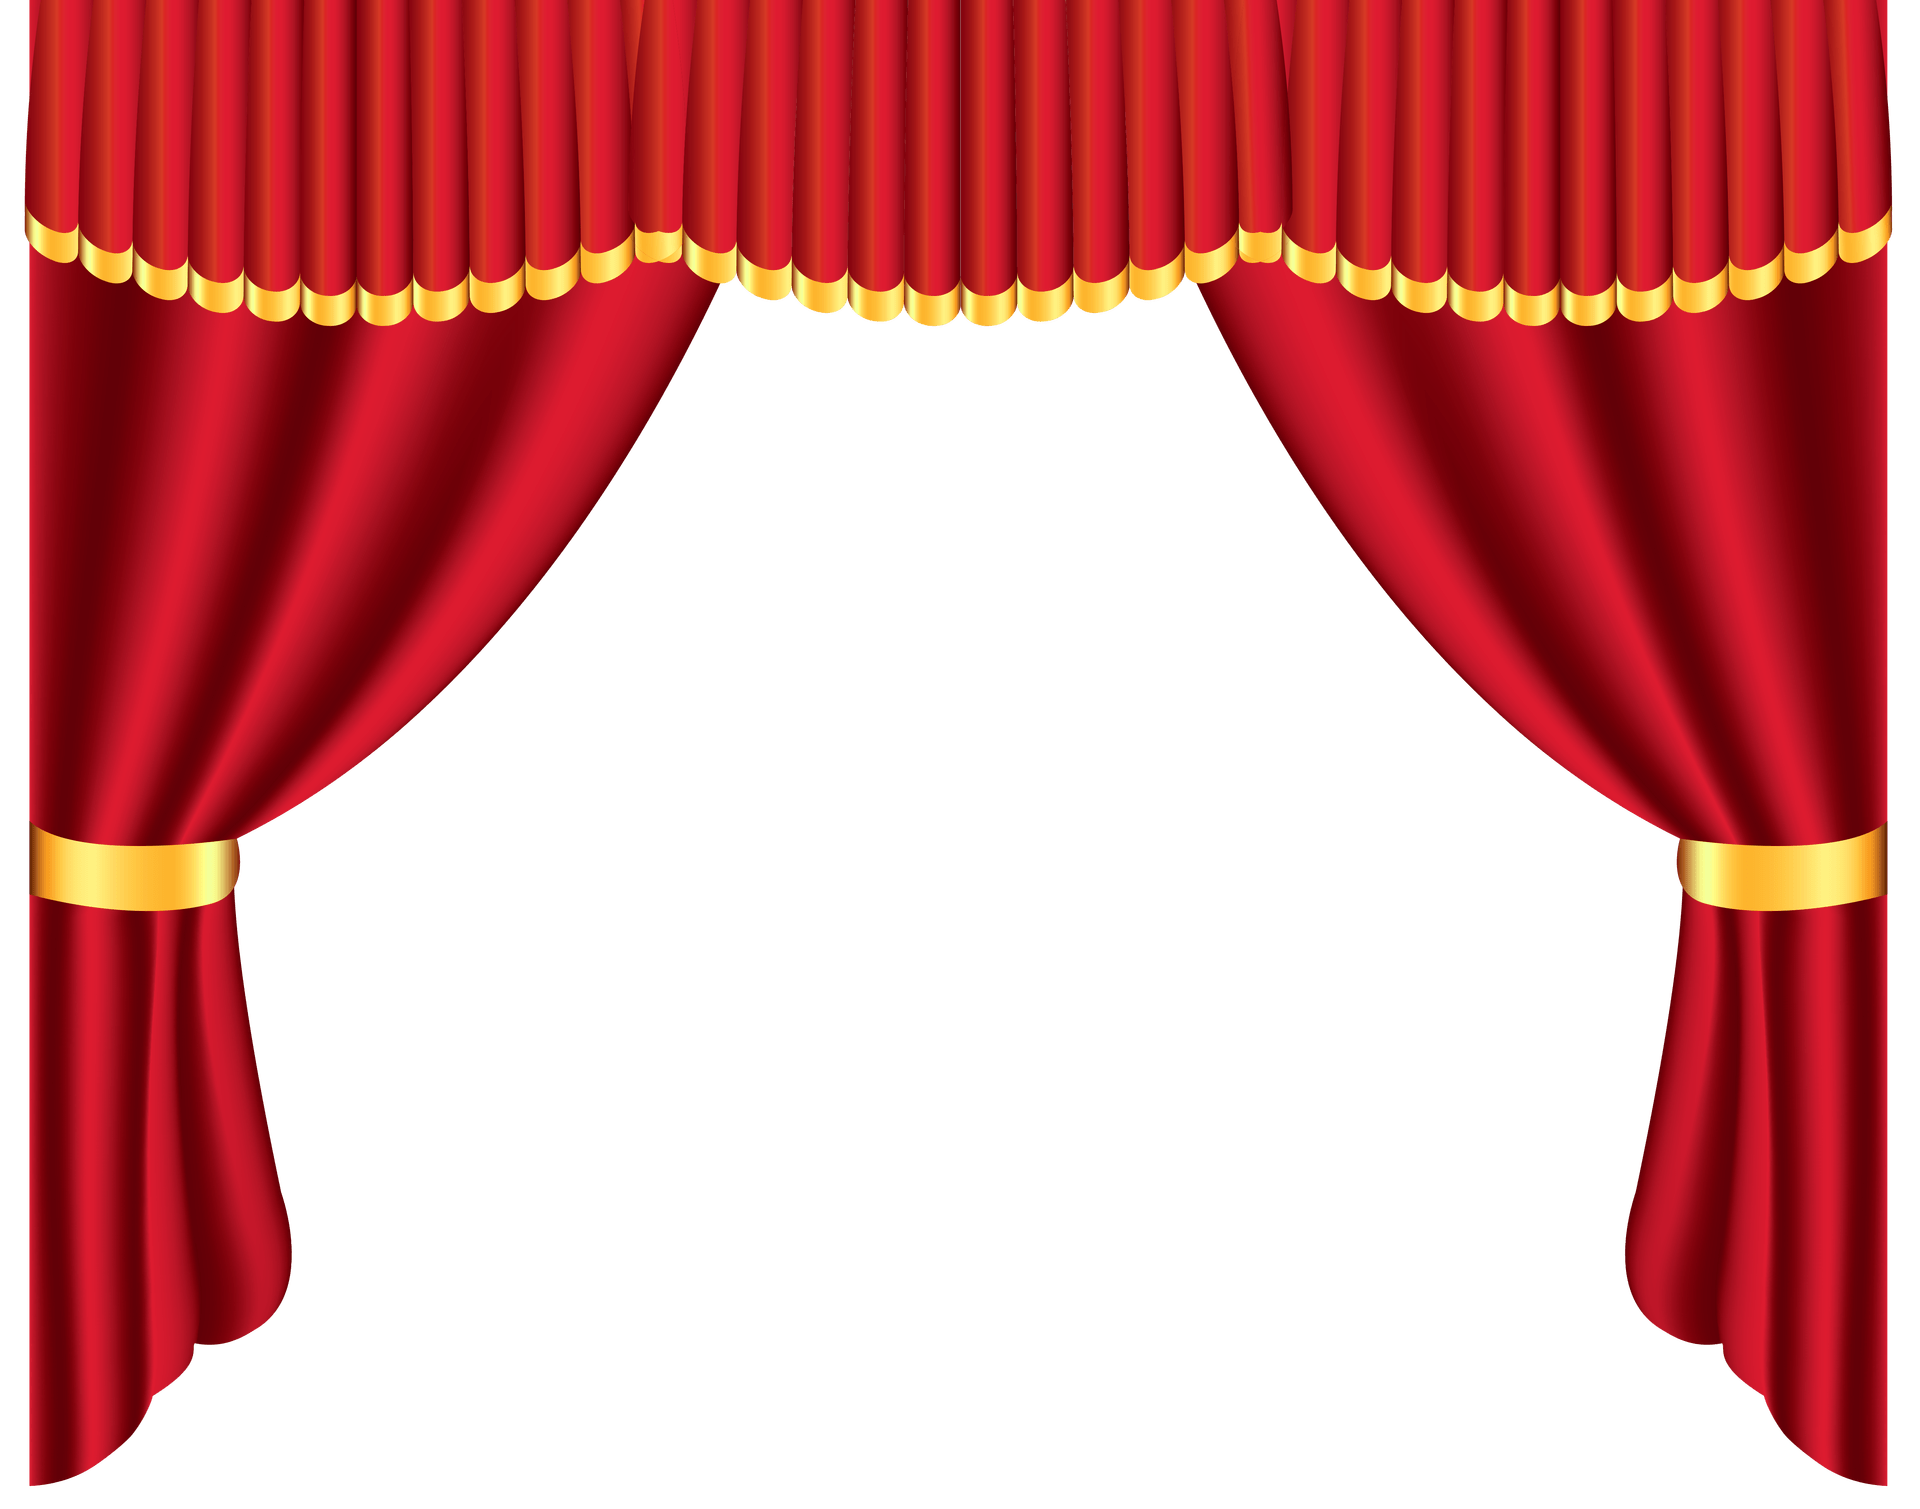 banner transparent download . Curtain clipart curtain raiser